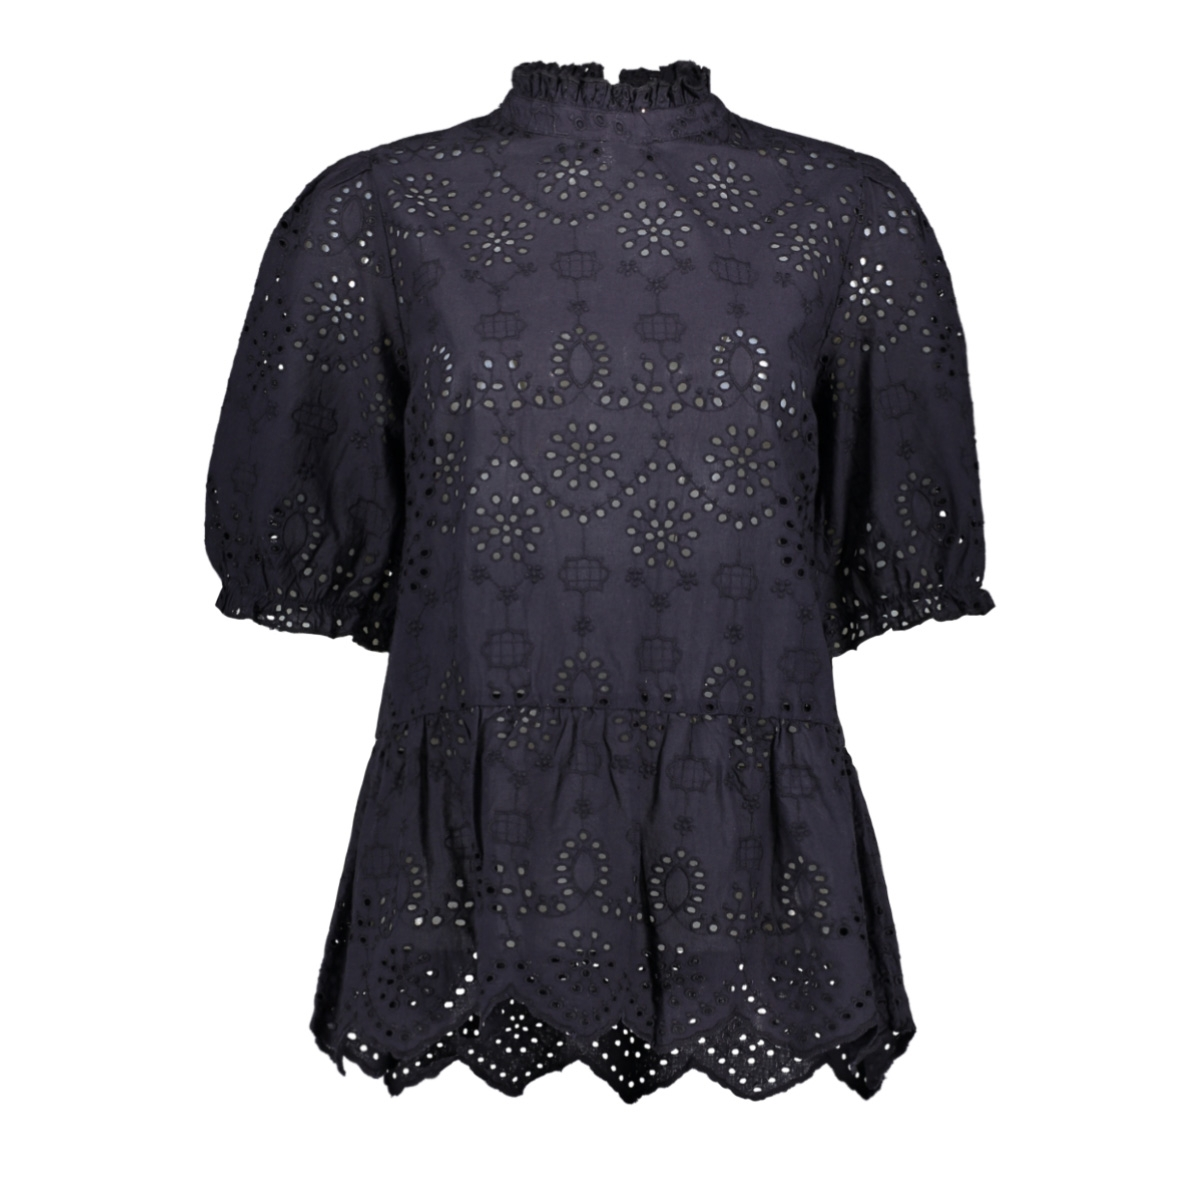 aleksasz ss blouse 30510270 saint tropez blouse 193911